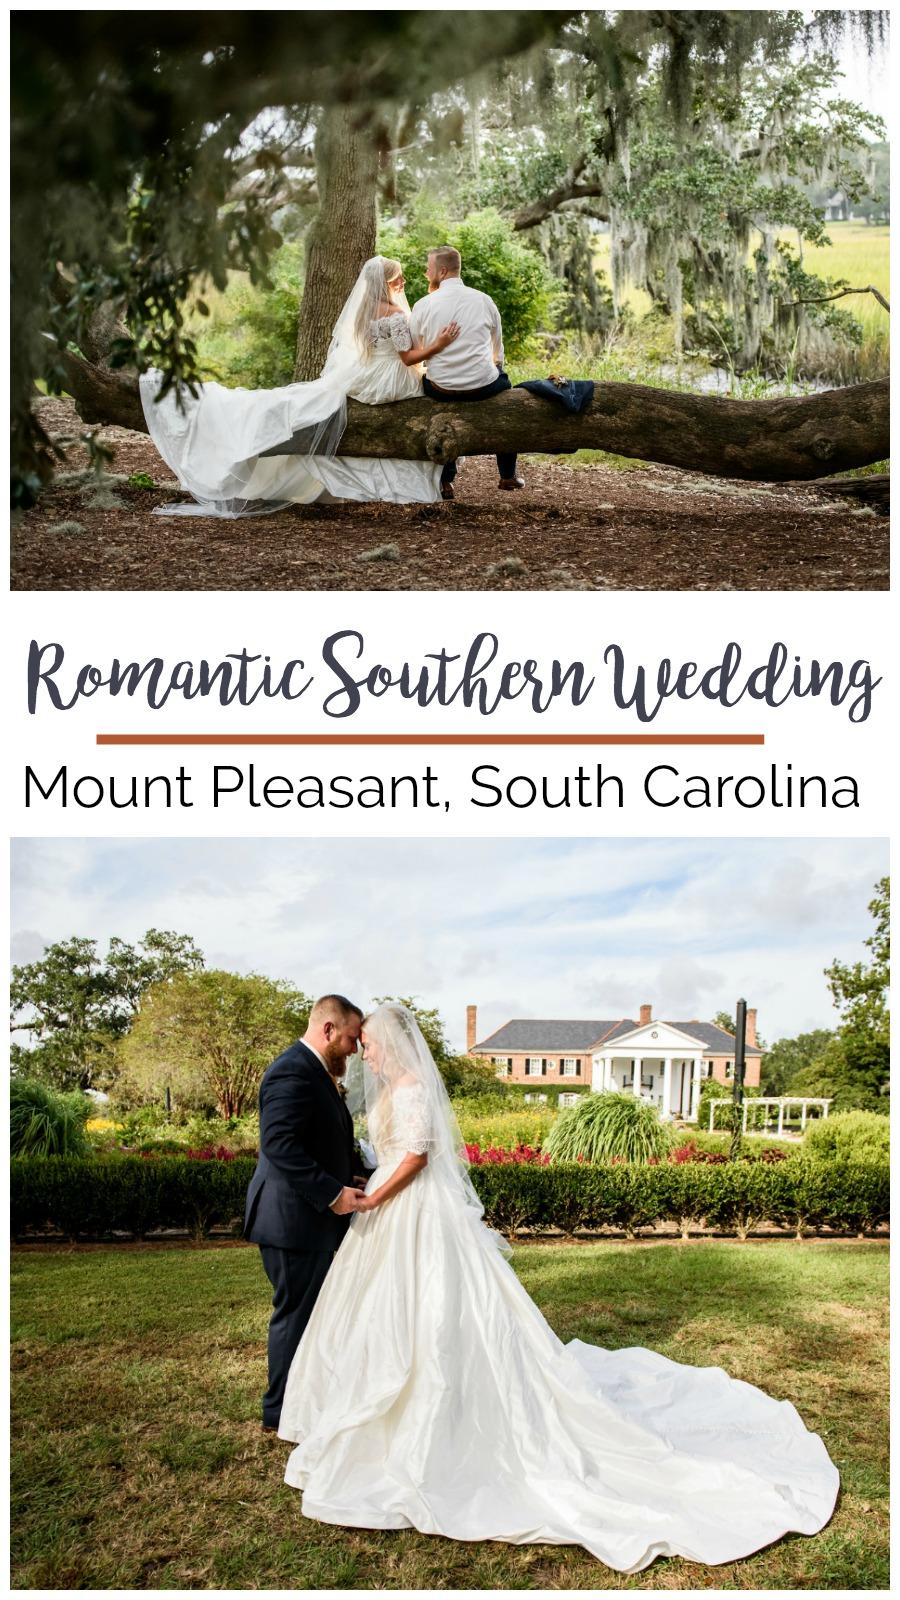 Jillian and Bill: Dreamy Boone Hall Plantation Wedding, Mount Pleasant, South Carolina | Palmetto State Weddings | f8 photo studio | southern wedding inspiration | Charleston wedding venues